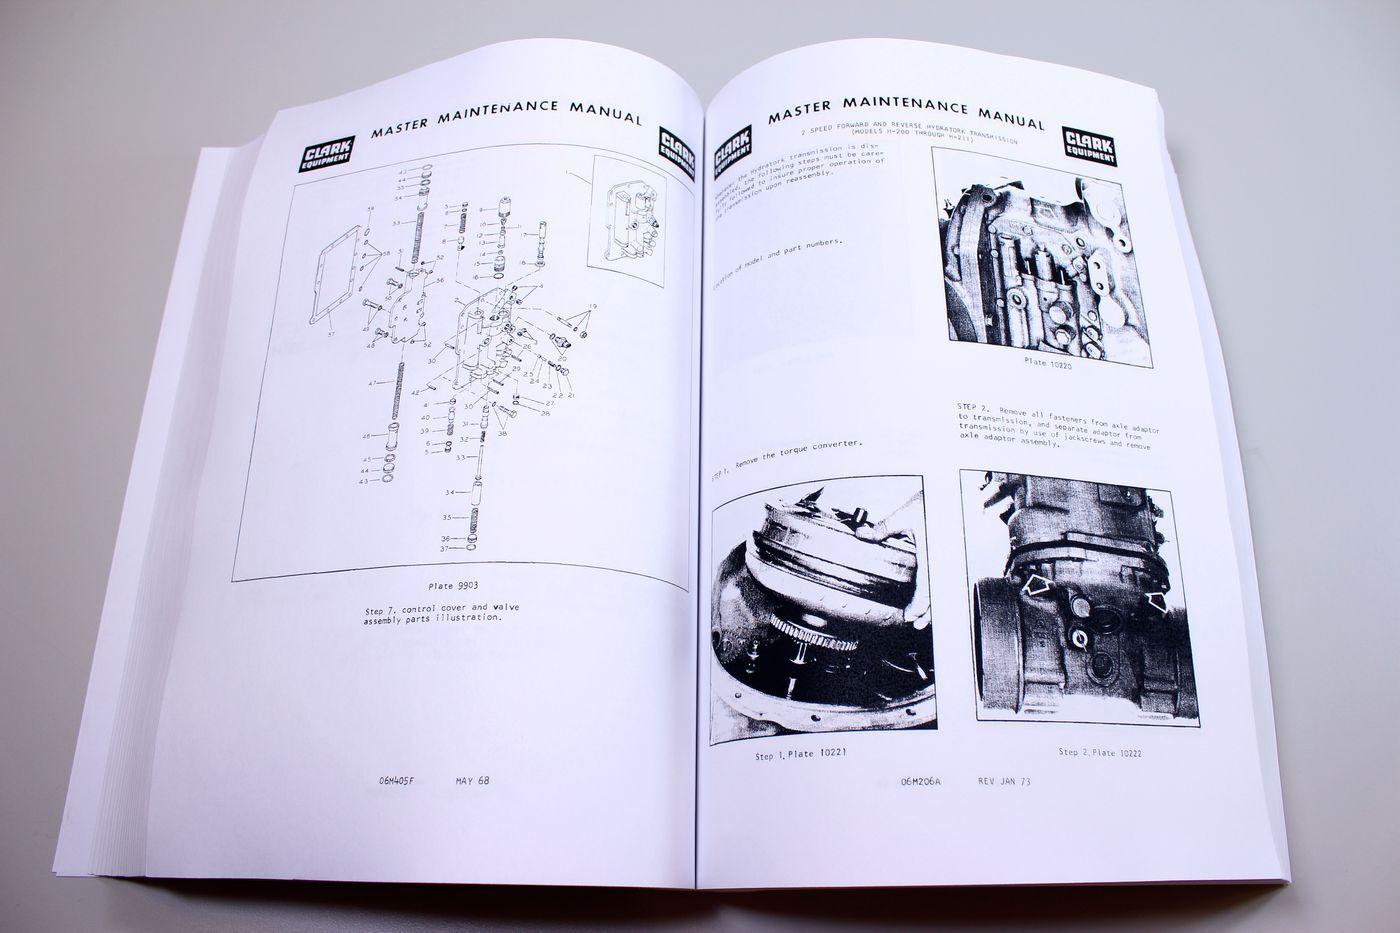 Clark C500-h40 C500-h45 Forklift Service Repair Shop Manual C500h40 C500h45  | eBay